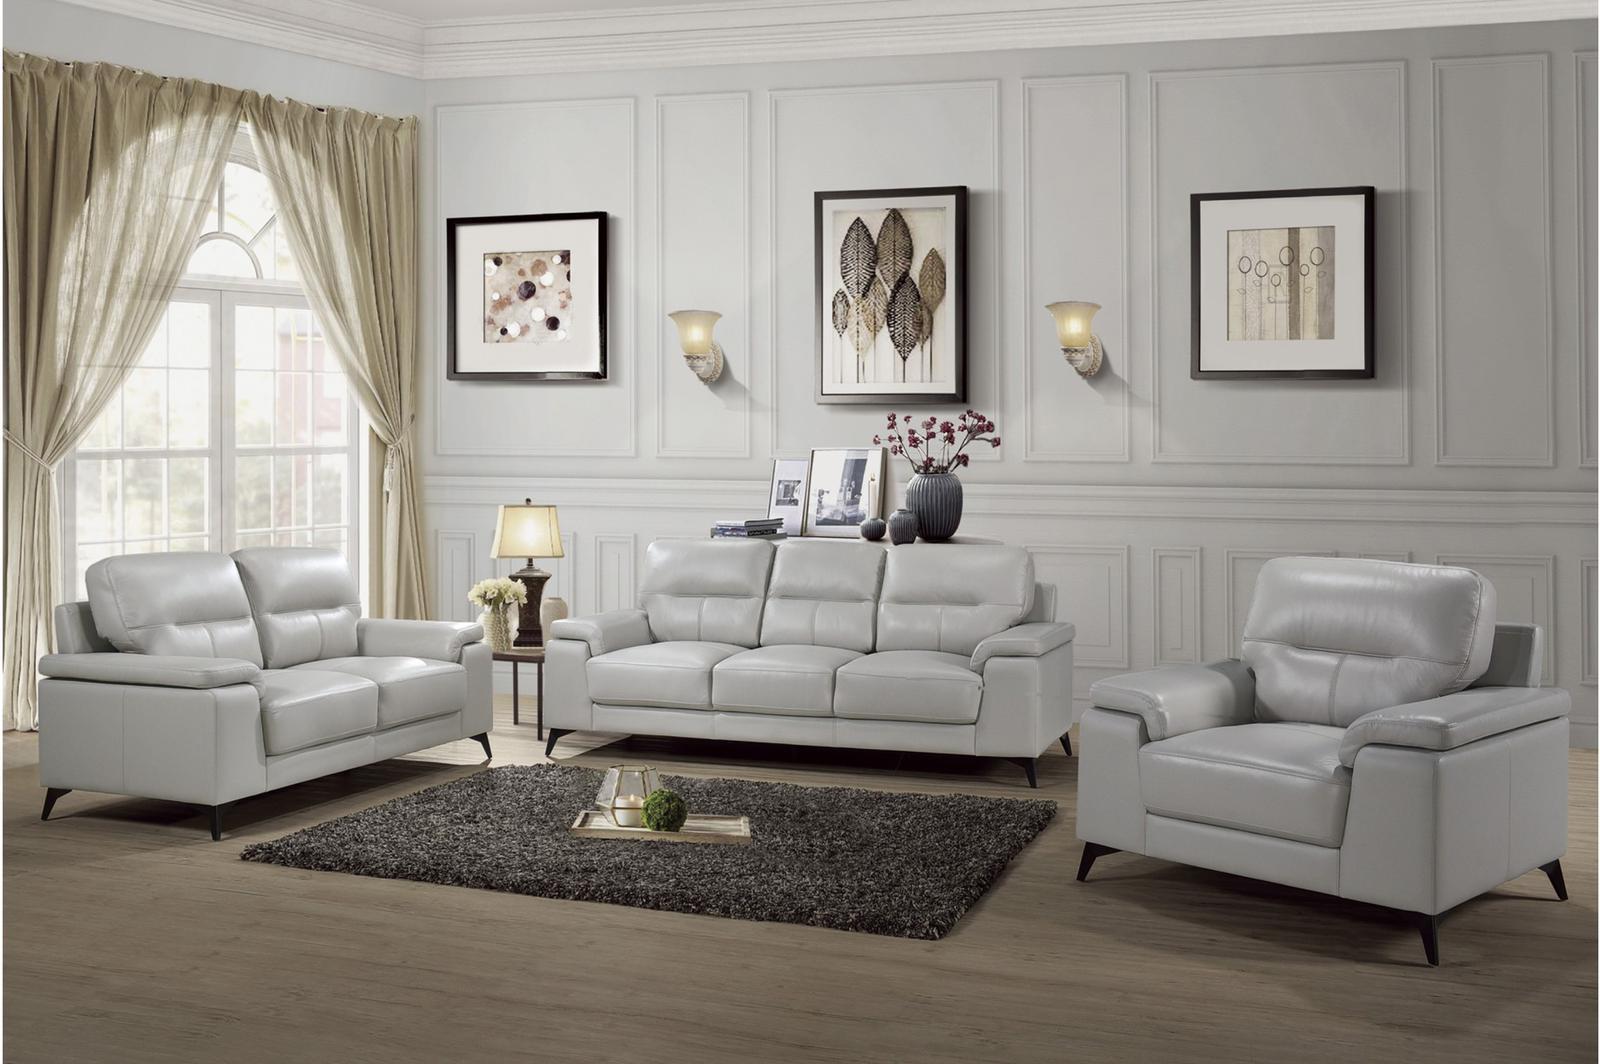 furniture-houston (6)